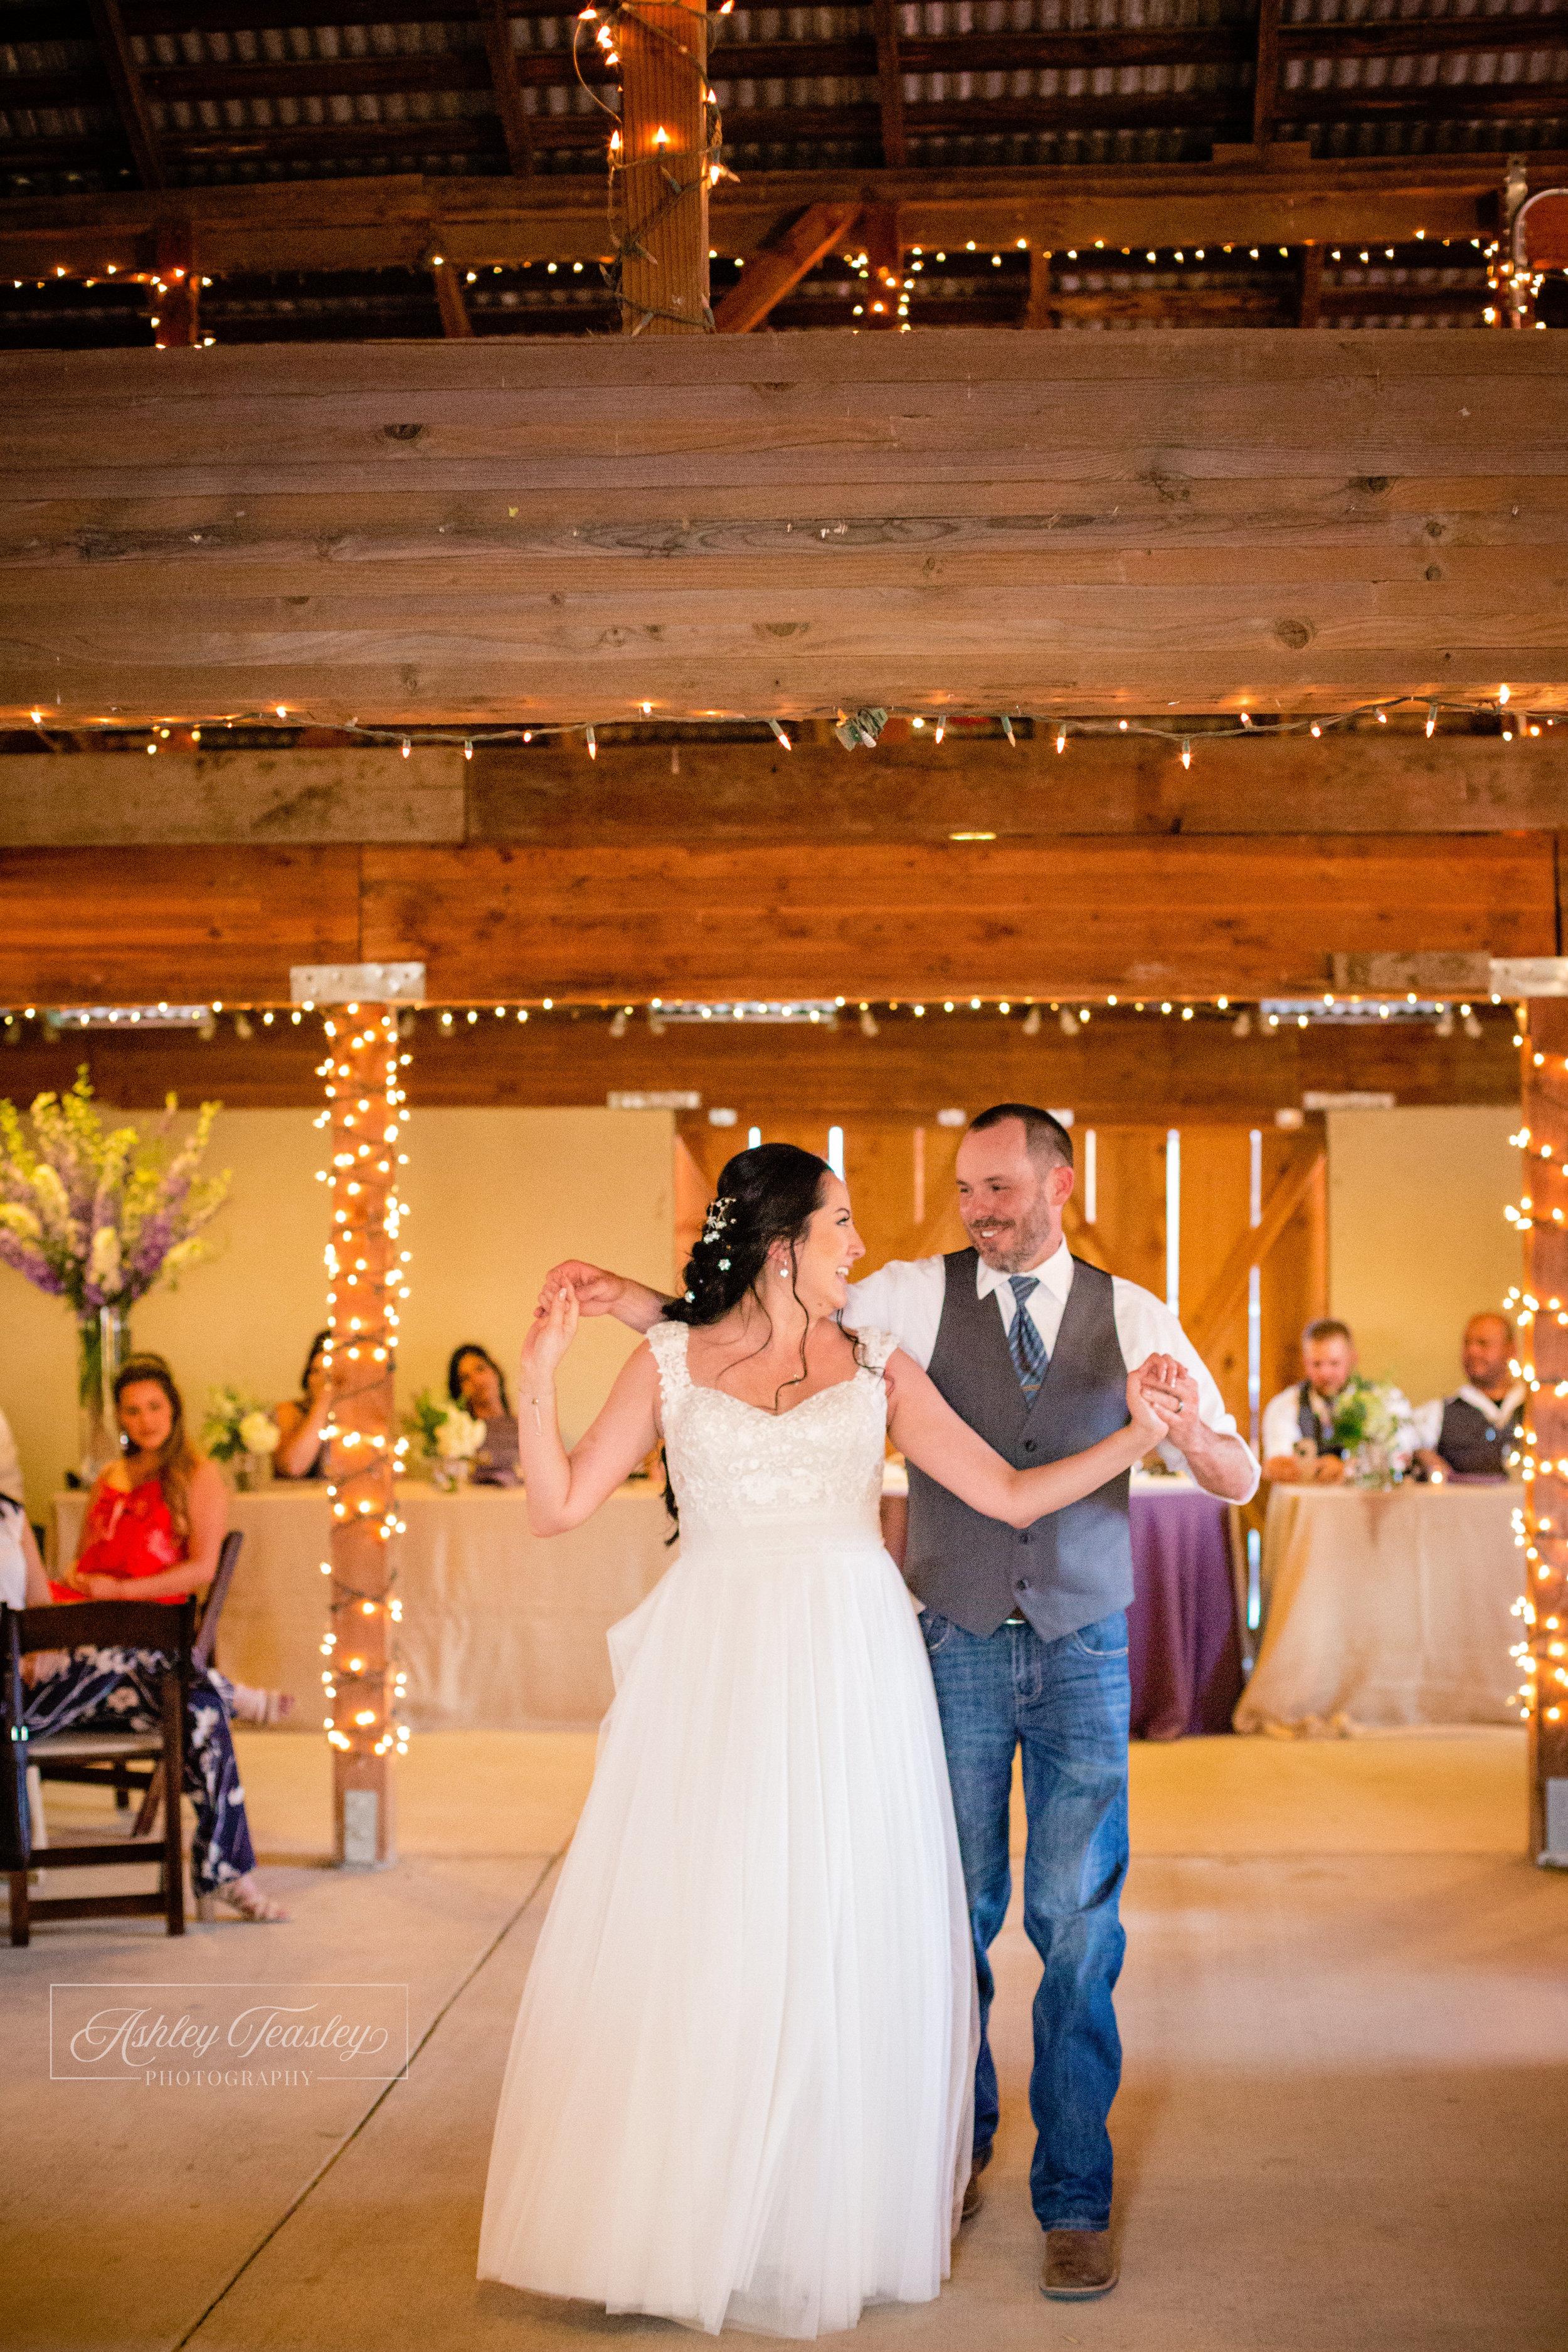 Jeanette & Rance - Butte Star Ranch - Sacramento Wedding Photographer - Ashley Teasley Photography (10 of 41).jpg